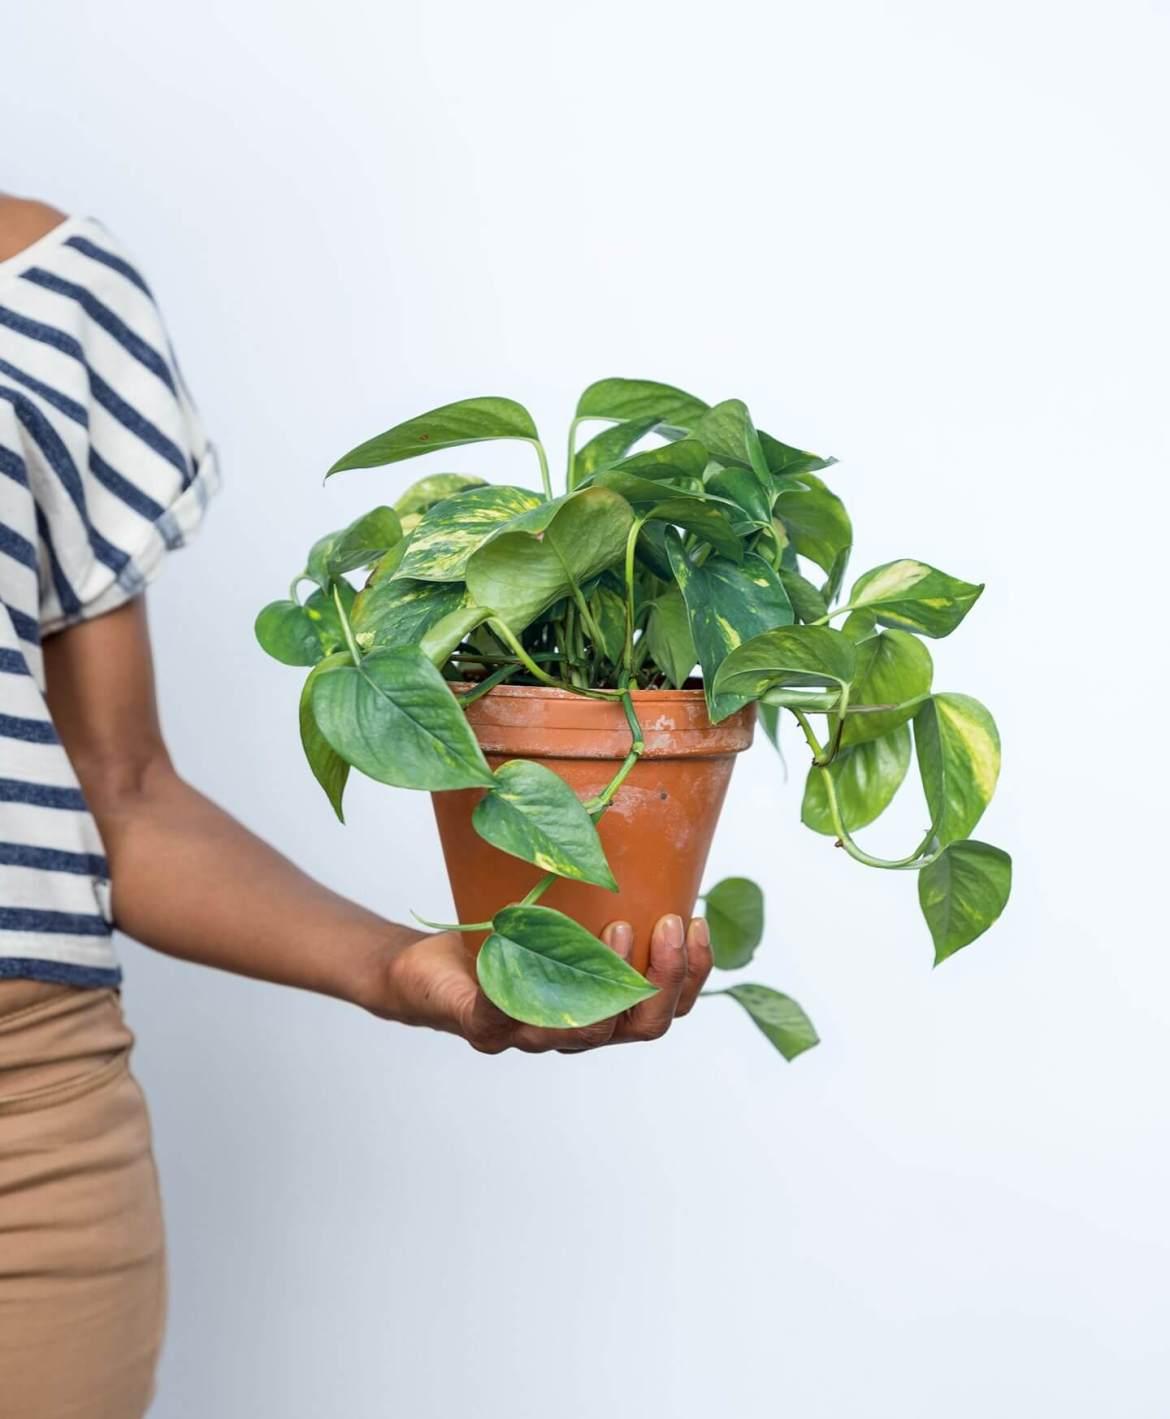 Easy Houseplant | Pothos | Home Decor - Mass Over Matter